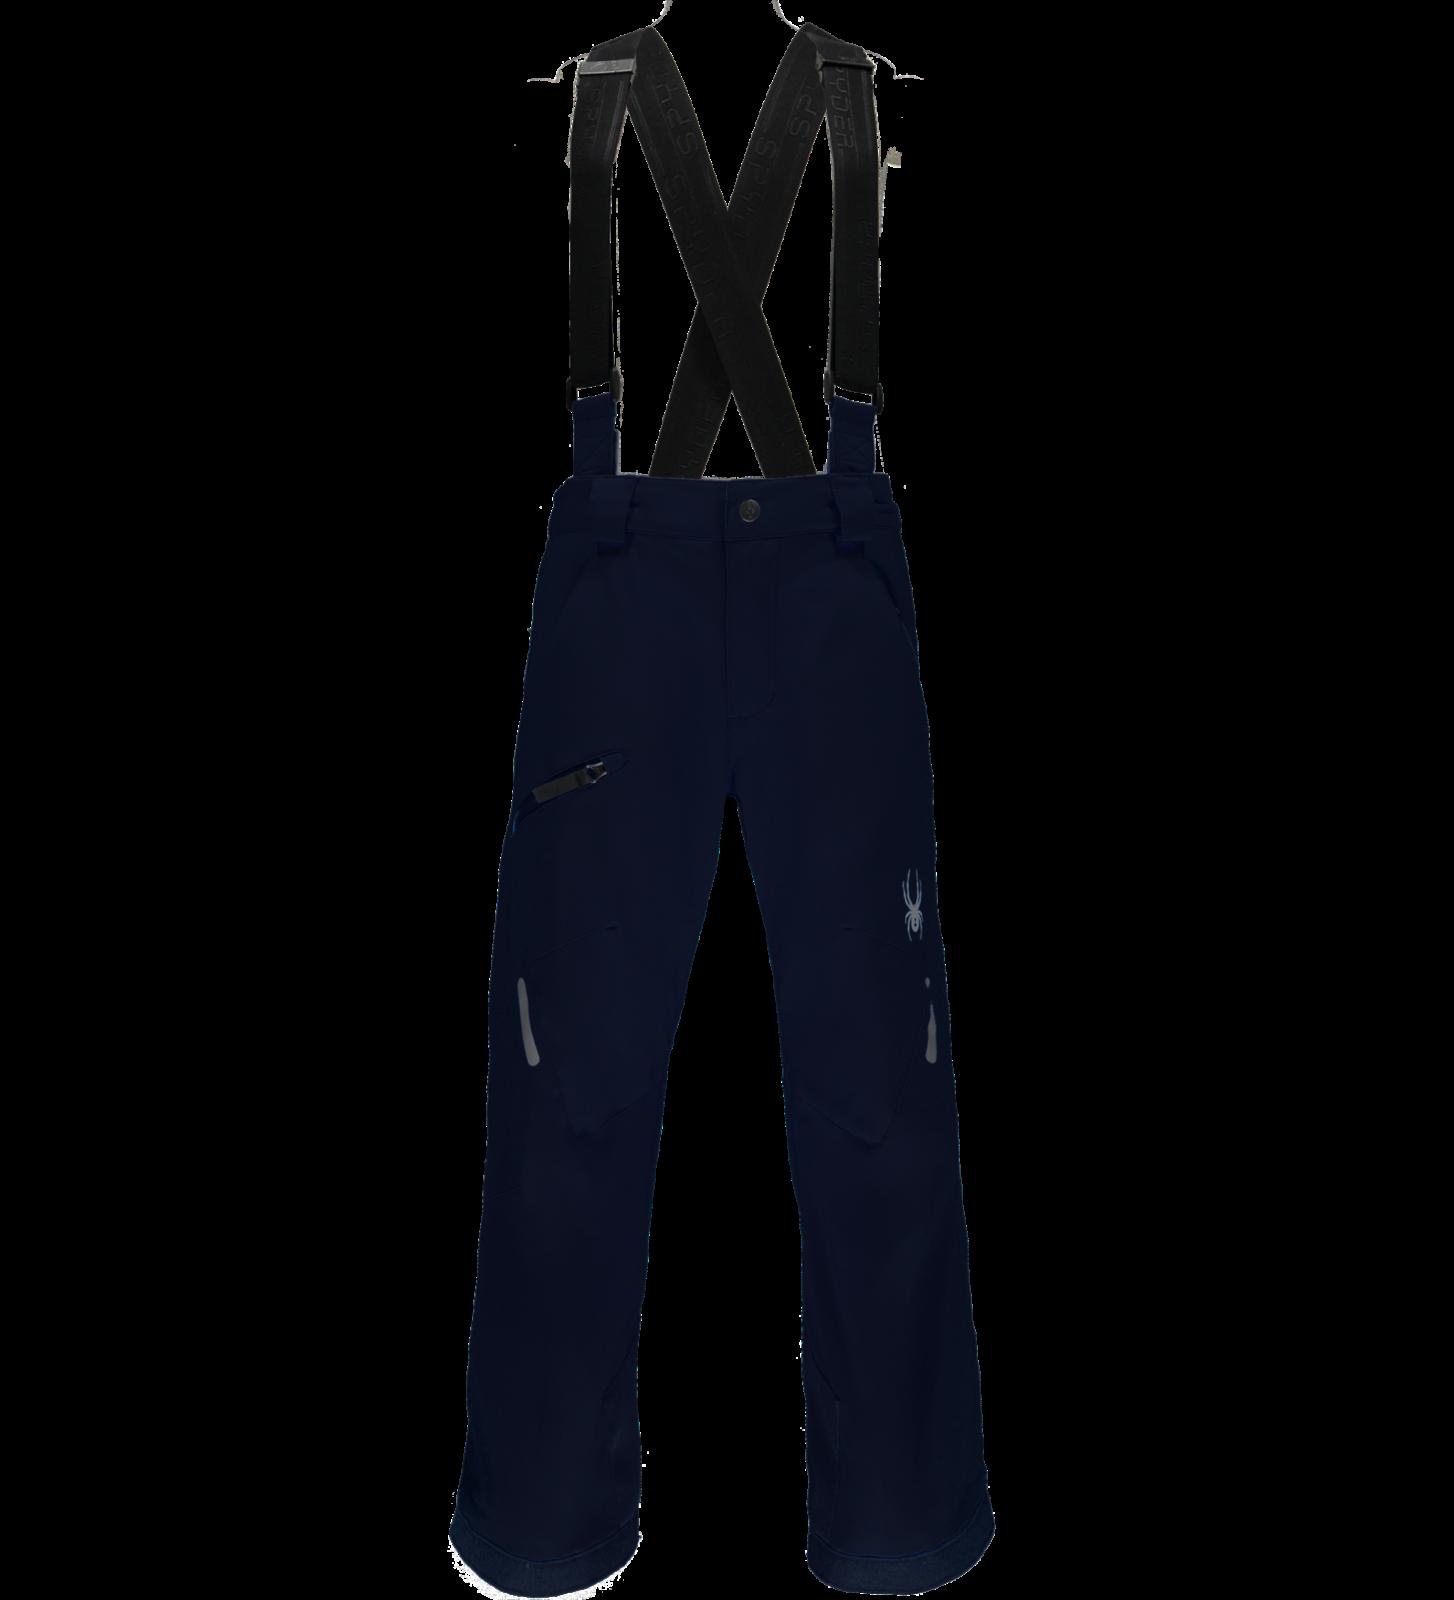 2017/18 Spyder Boy's Propulsion Pant